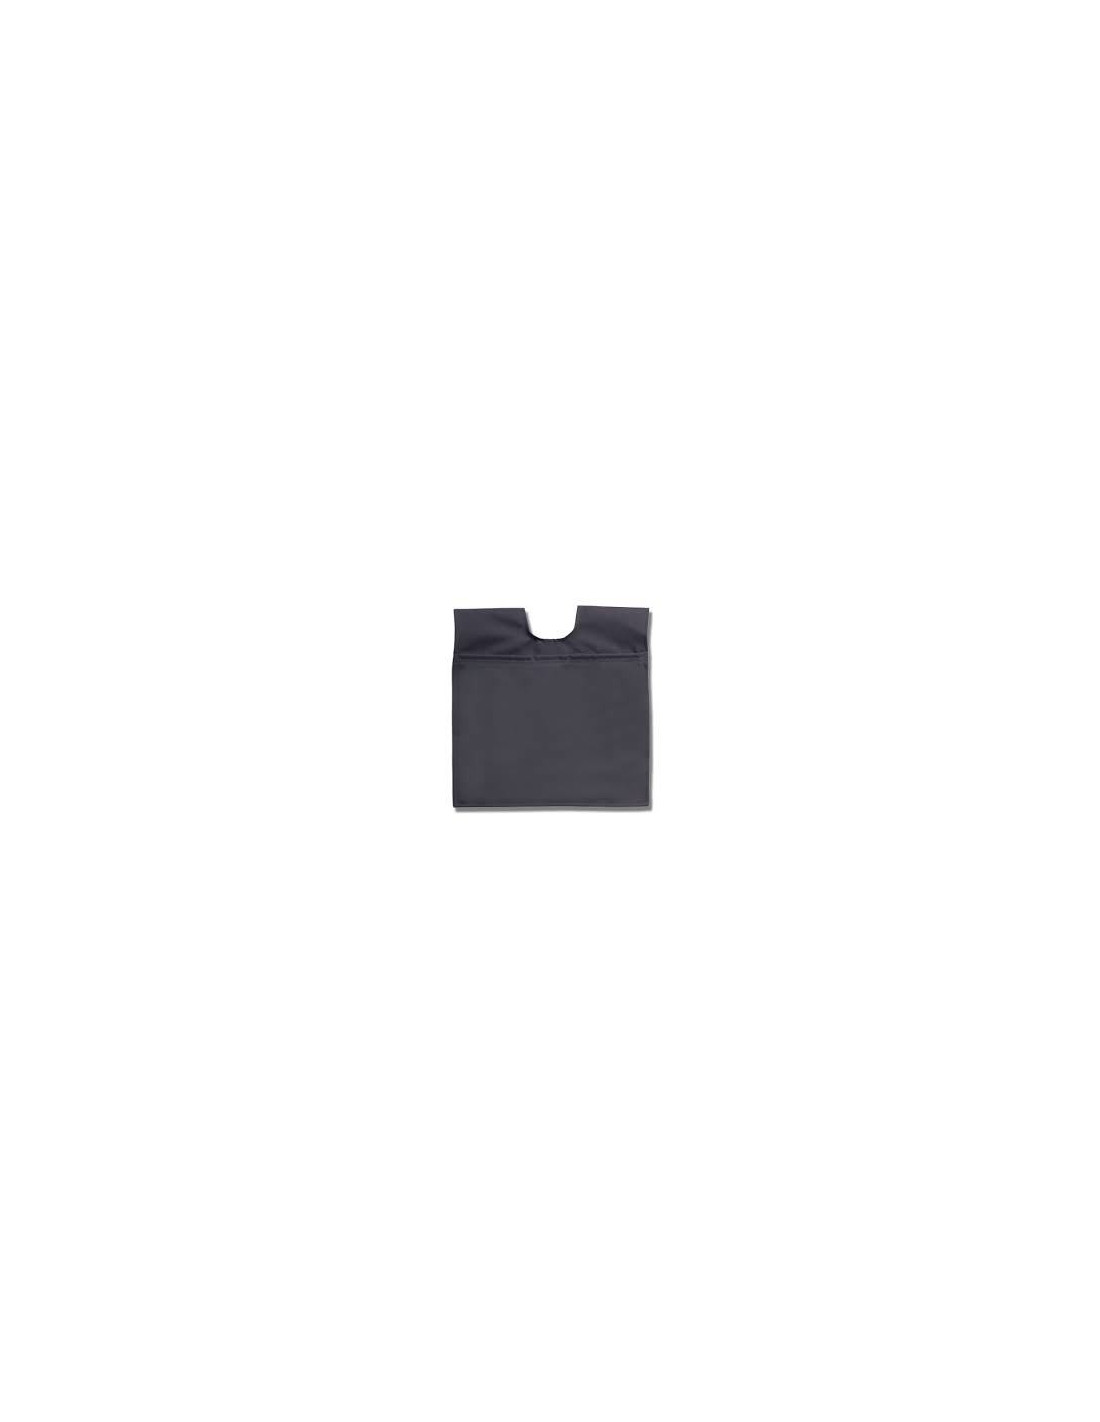 Rawlings Pro Style Umpire Bag (UBBAG) Baseball-Softball - Sport House